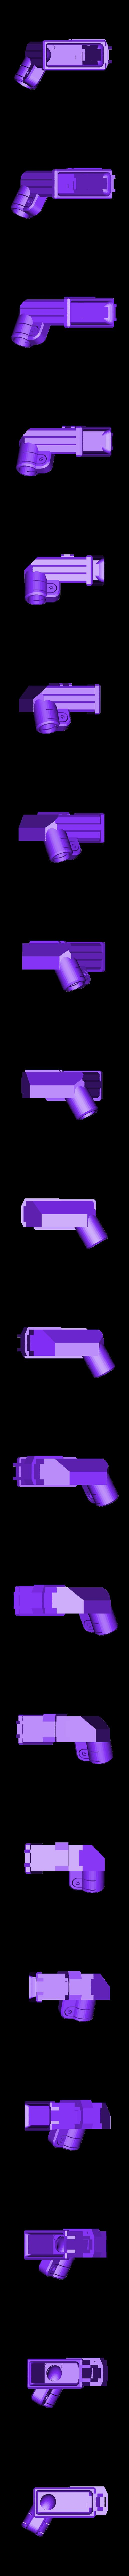 T15_magwell_PUMP_M3.stl Download free STL file T15 Mag Adapter Maverick, Trracer pump paintball • 3D printer design, UntangleART